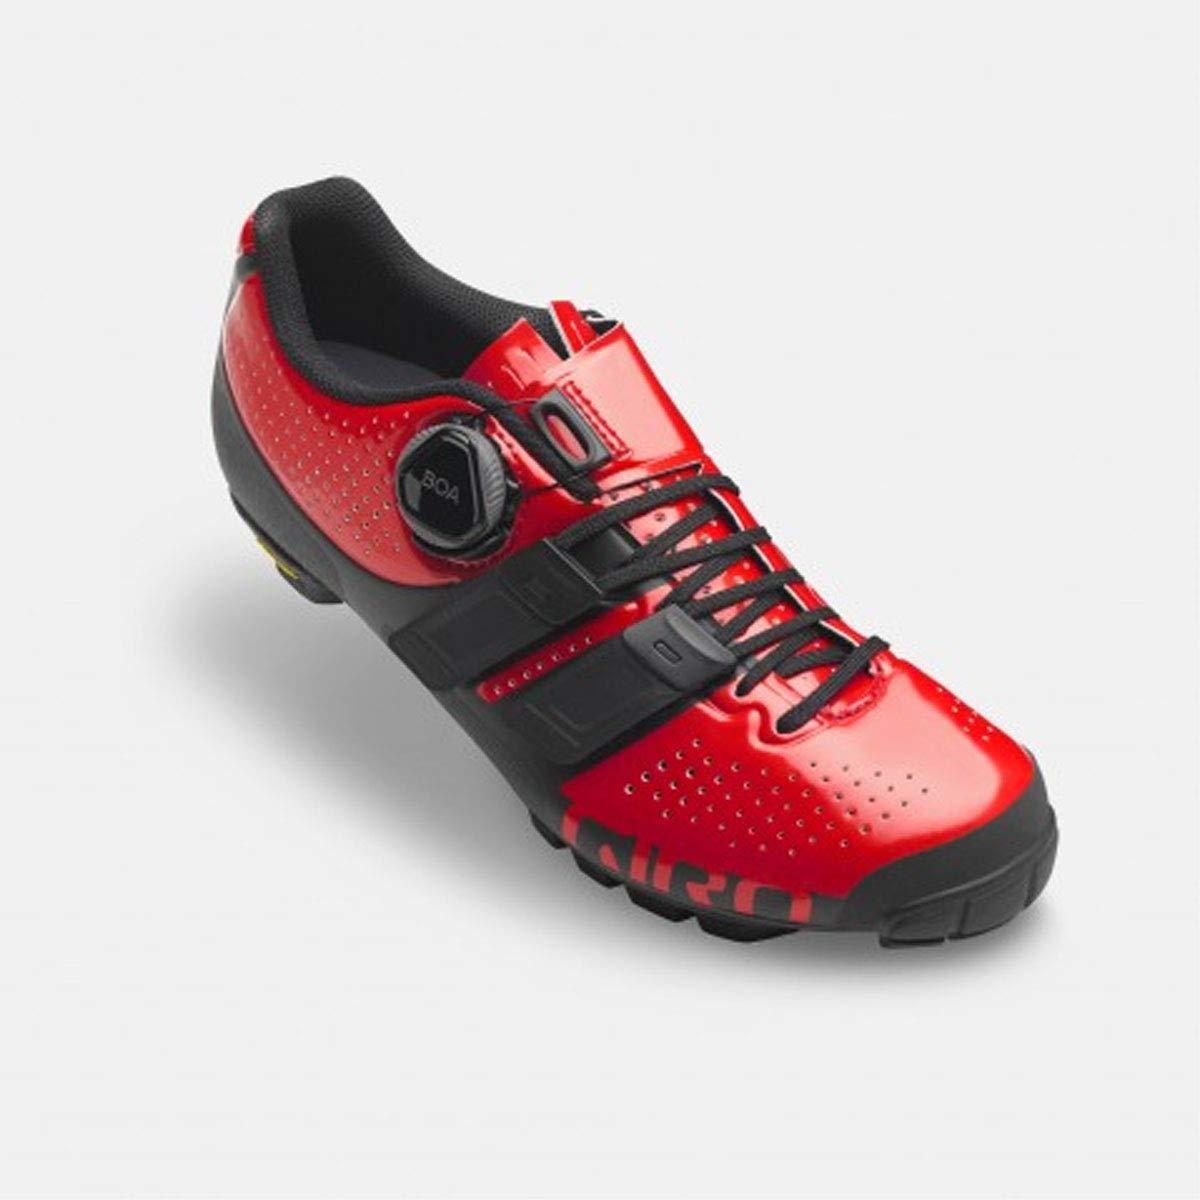 Giro SICA Techlace Damen MTB Fahrrad Schuhe rot rot rot schwarz 2019 d03bc5